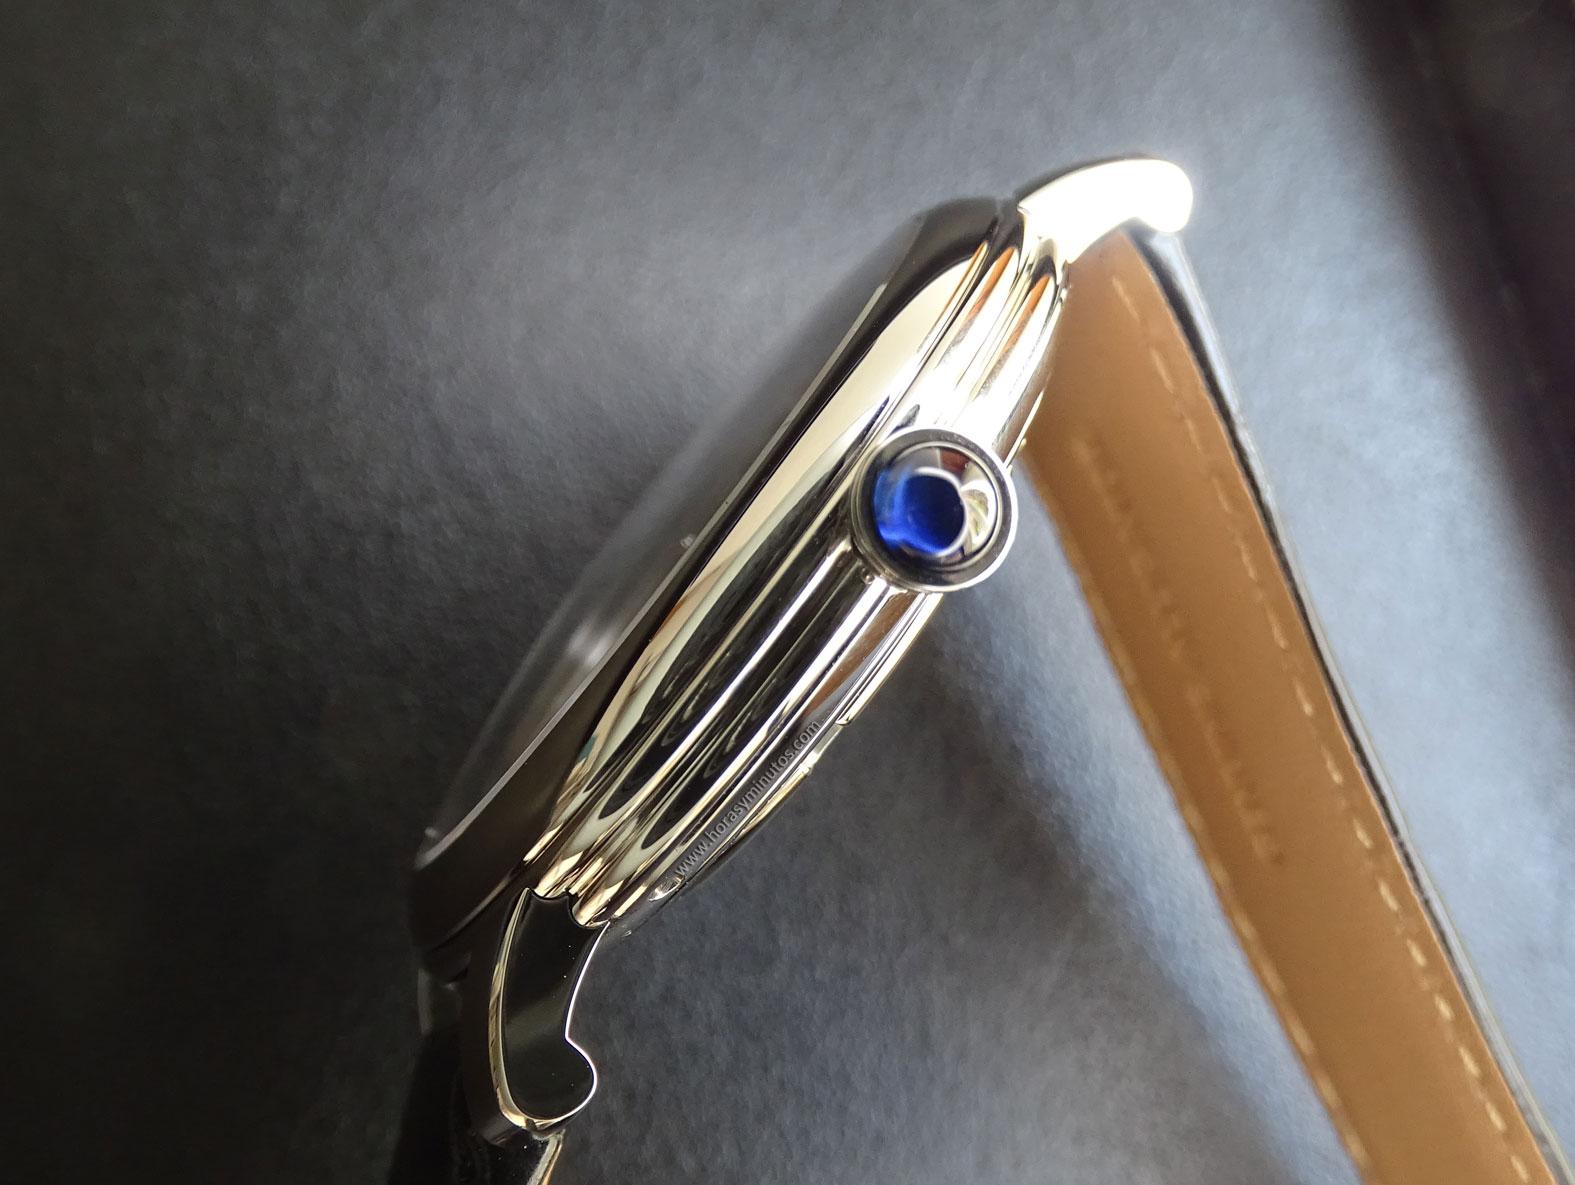 Boucheron Epure Acier 42 mm doble bocel de la carrura